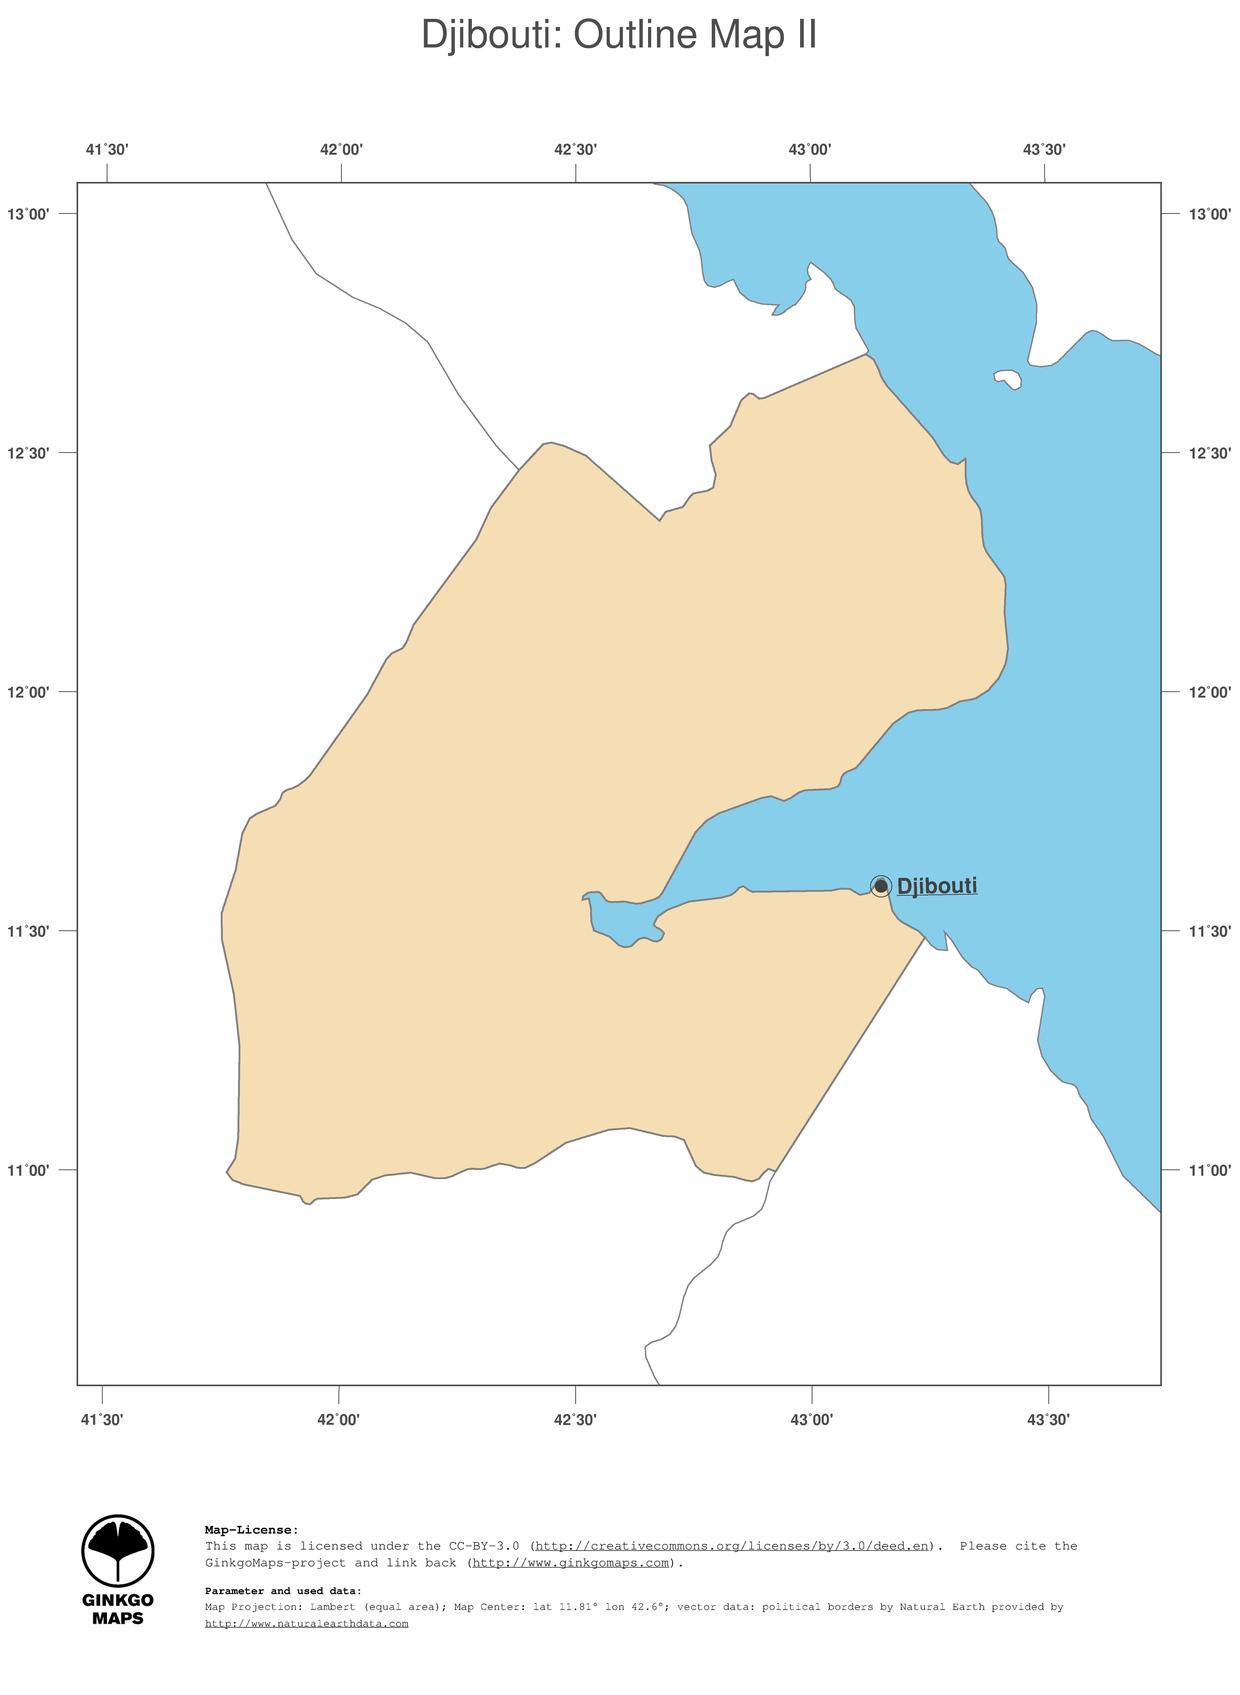 Map Djibouti; GinkgoMaps continent: Africa; region: Djibouti